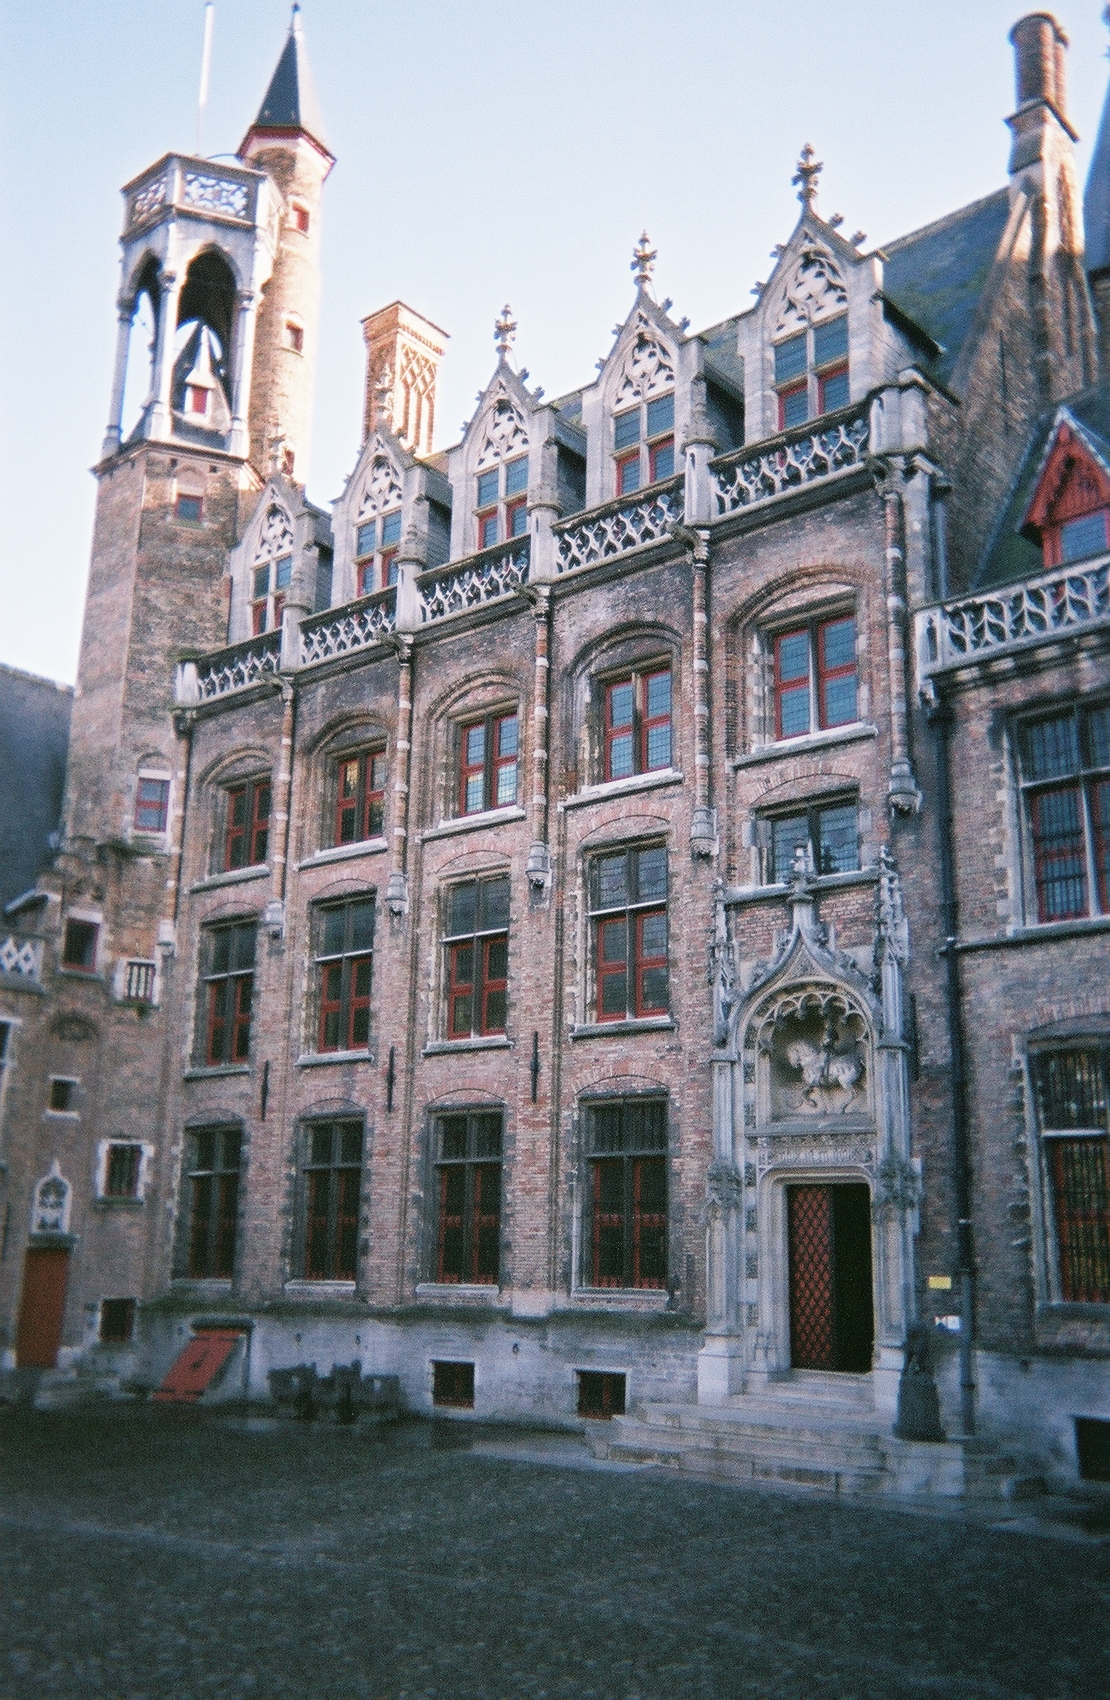 brugge-museum of brugge arriv aug09